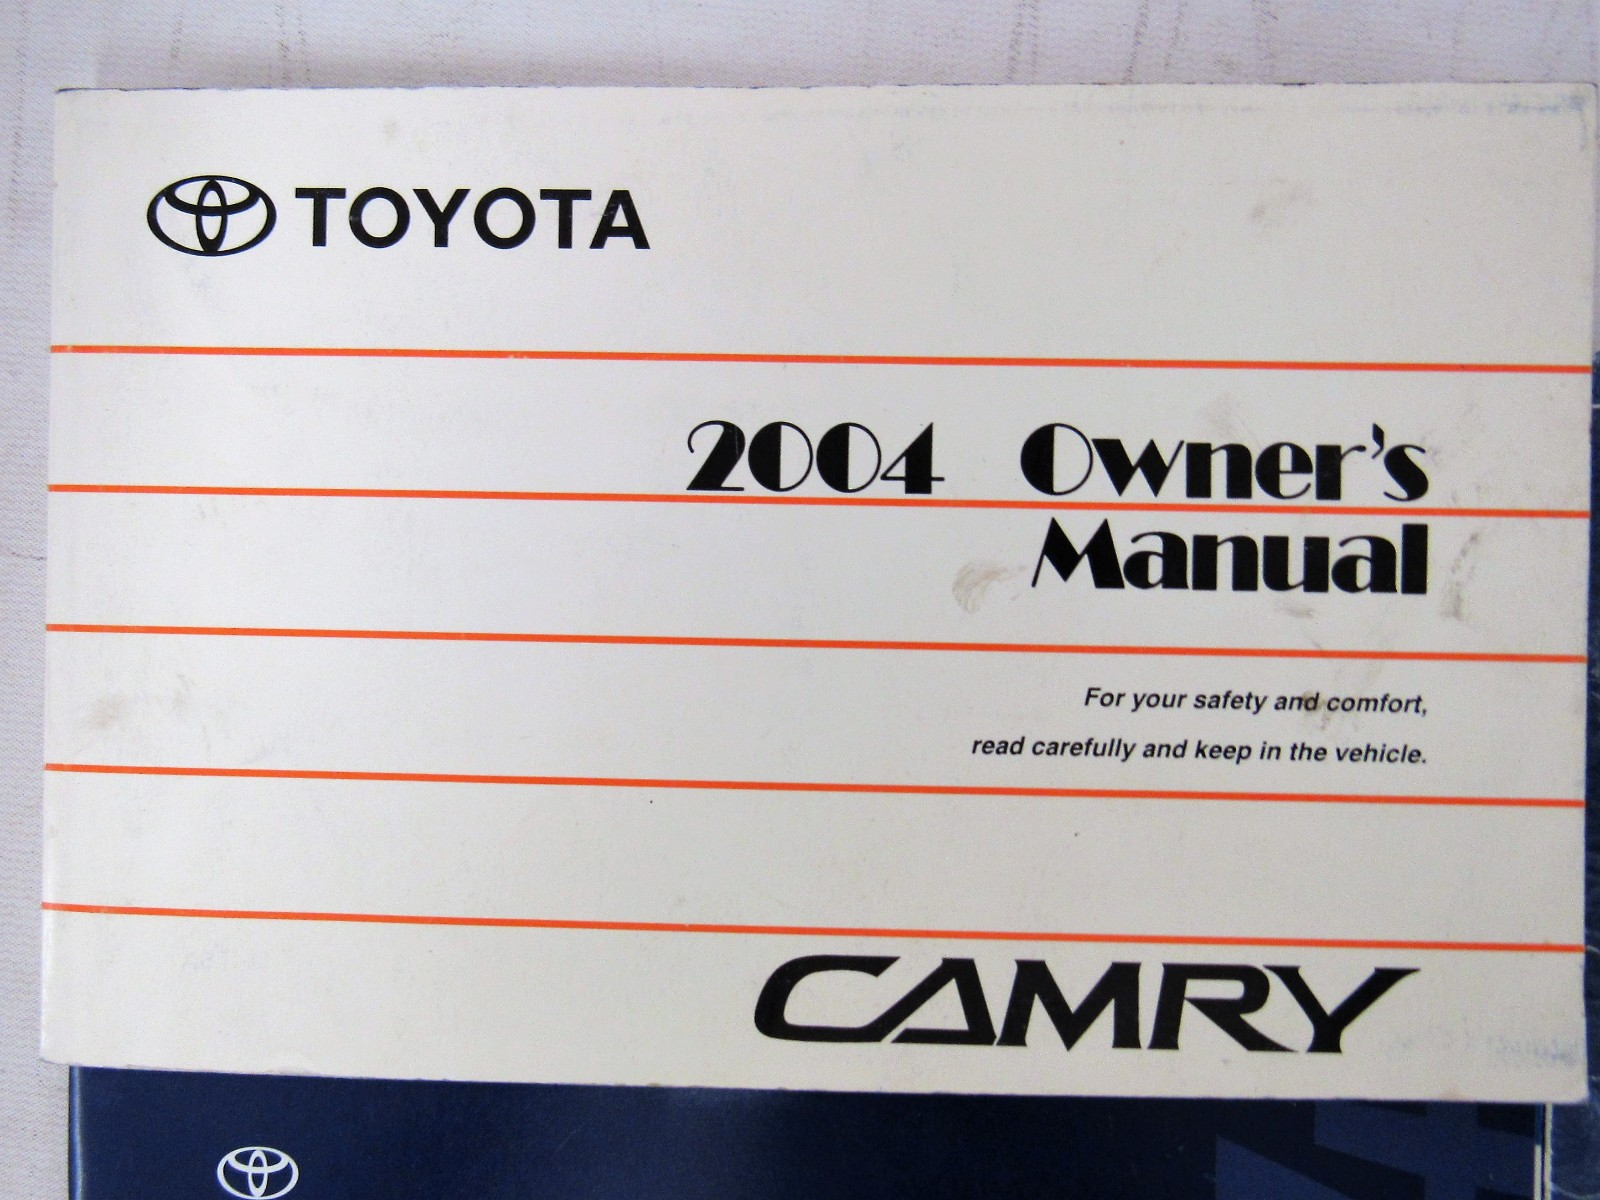 2004 toyota camry owners manual book bashful yak rh bashfulyak com toyota camry owners manual 1993 toyota camry owners manual 2011